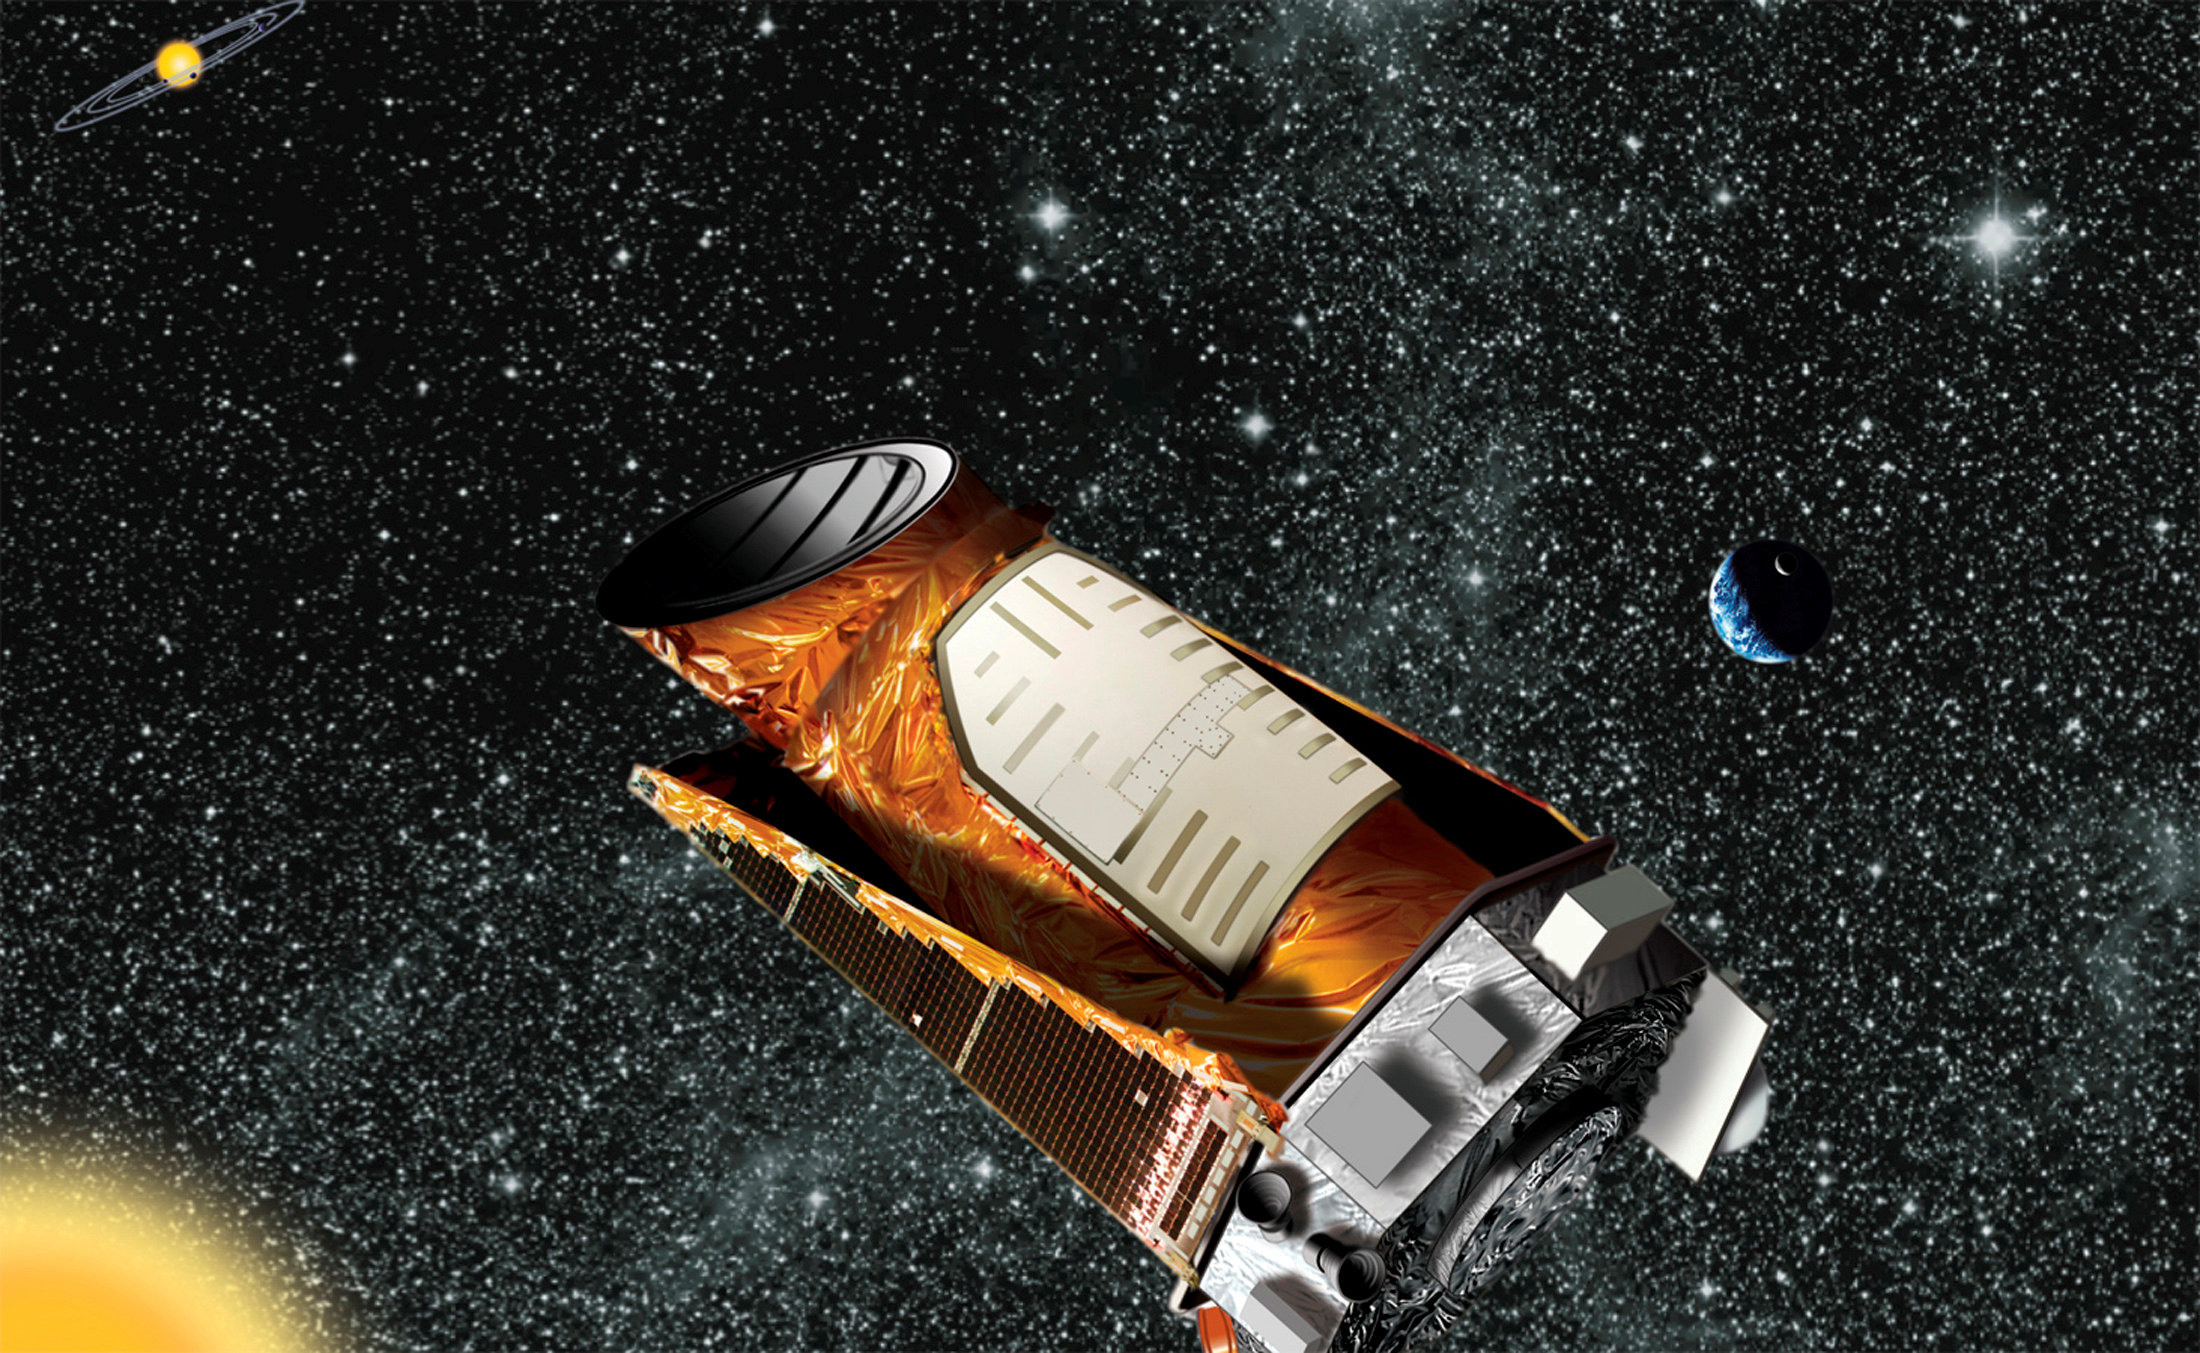 kepler spacecraft discoveries - HD1920×1200